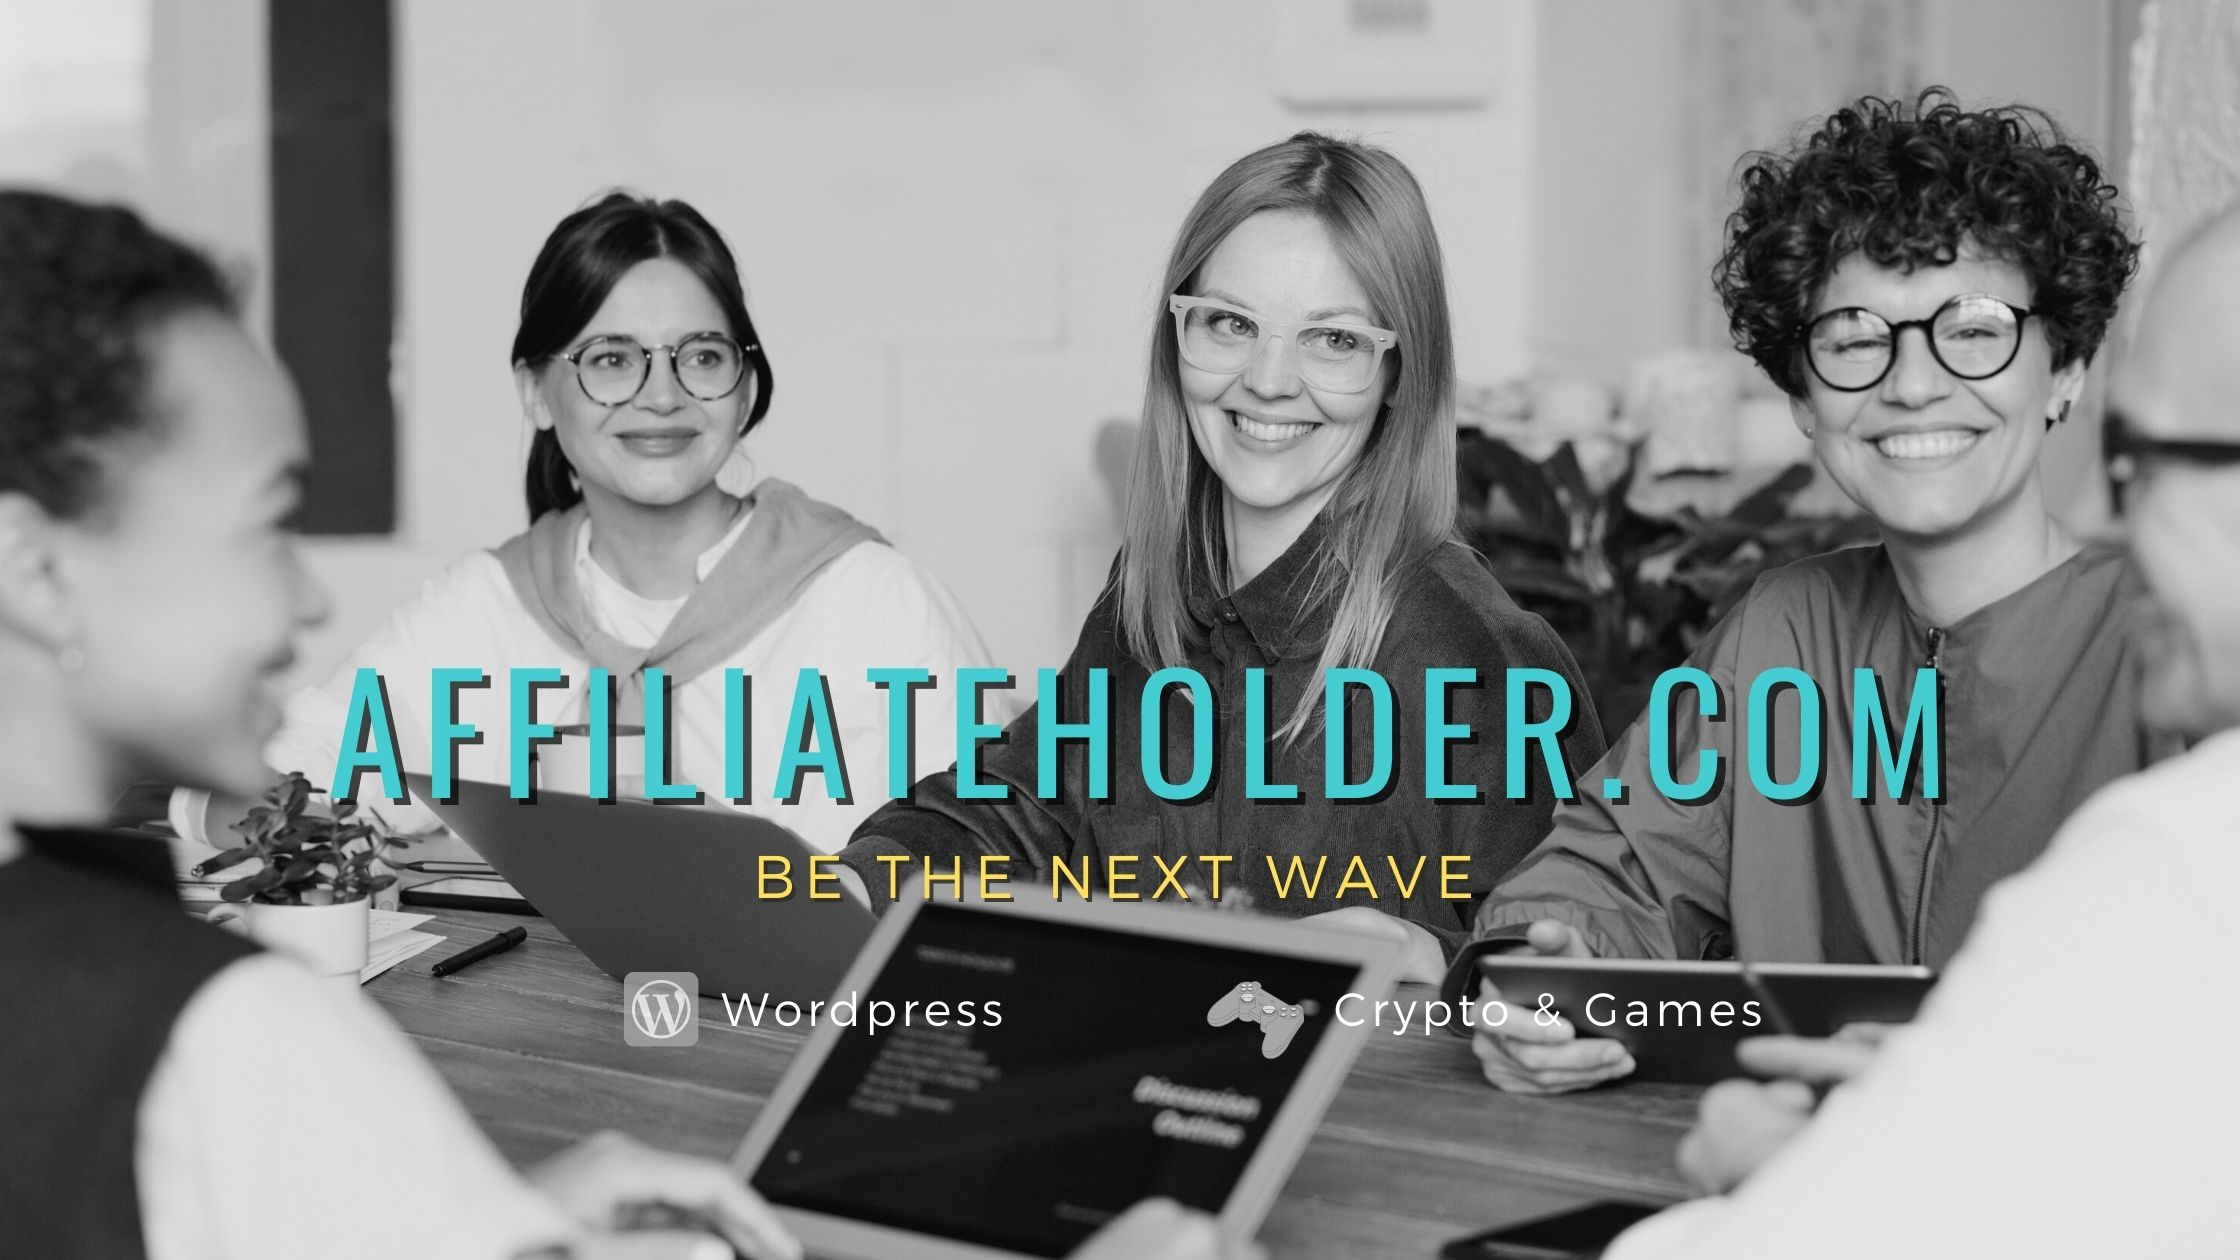 Affiliateholder.com